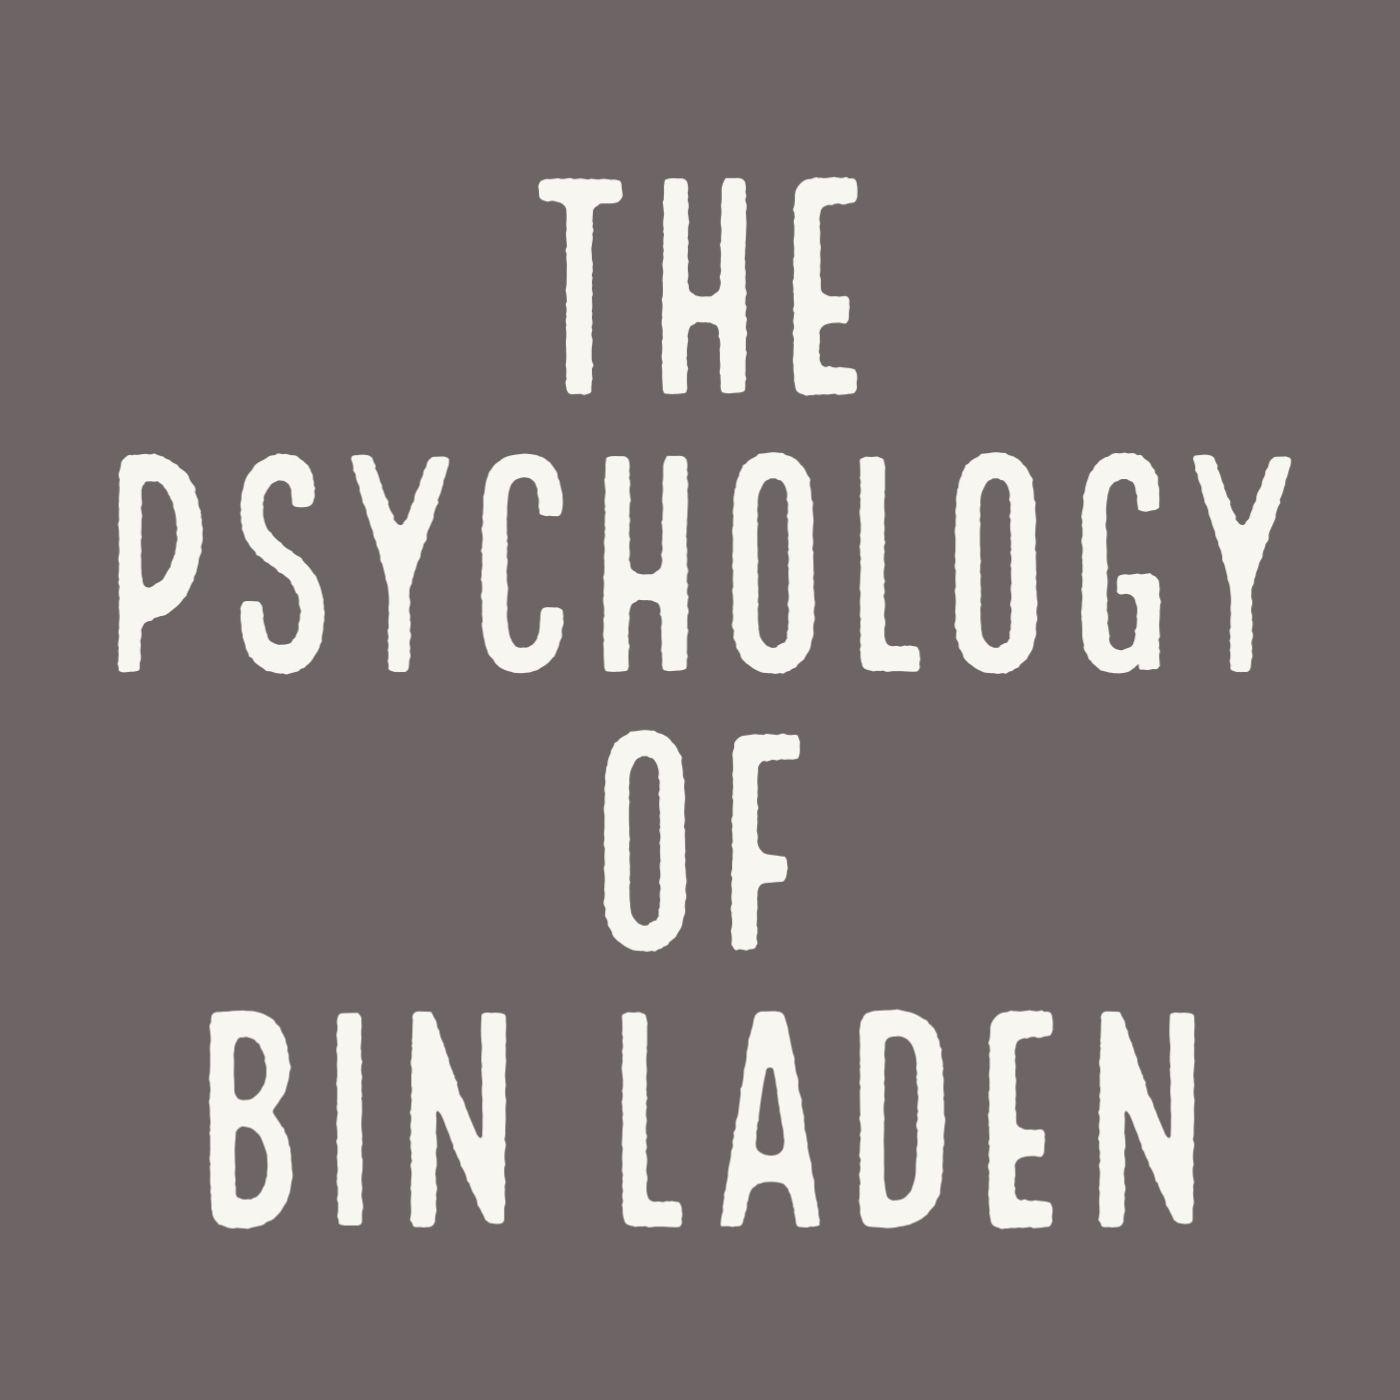 The Psychology of Bin Laden